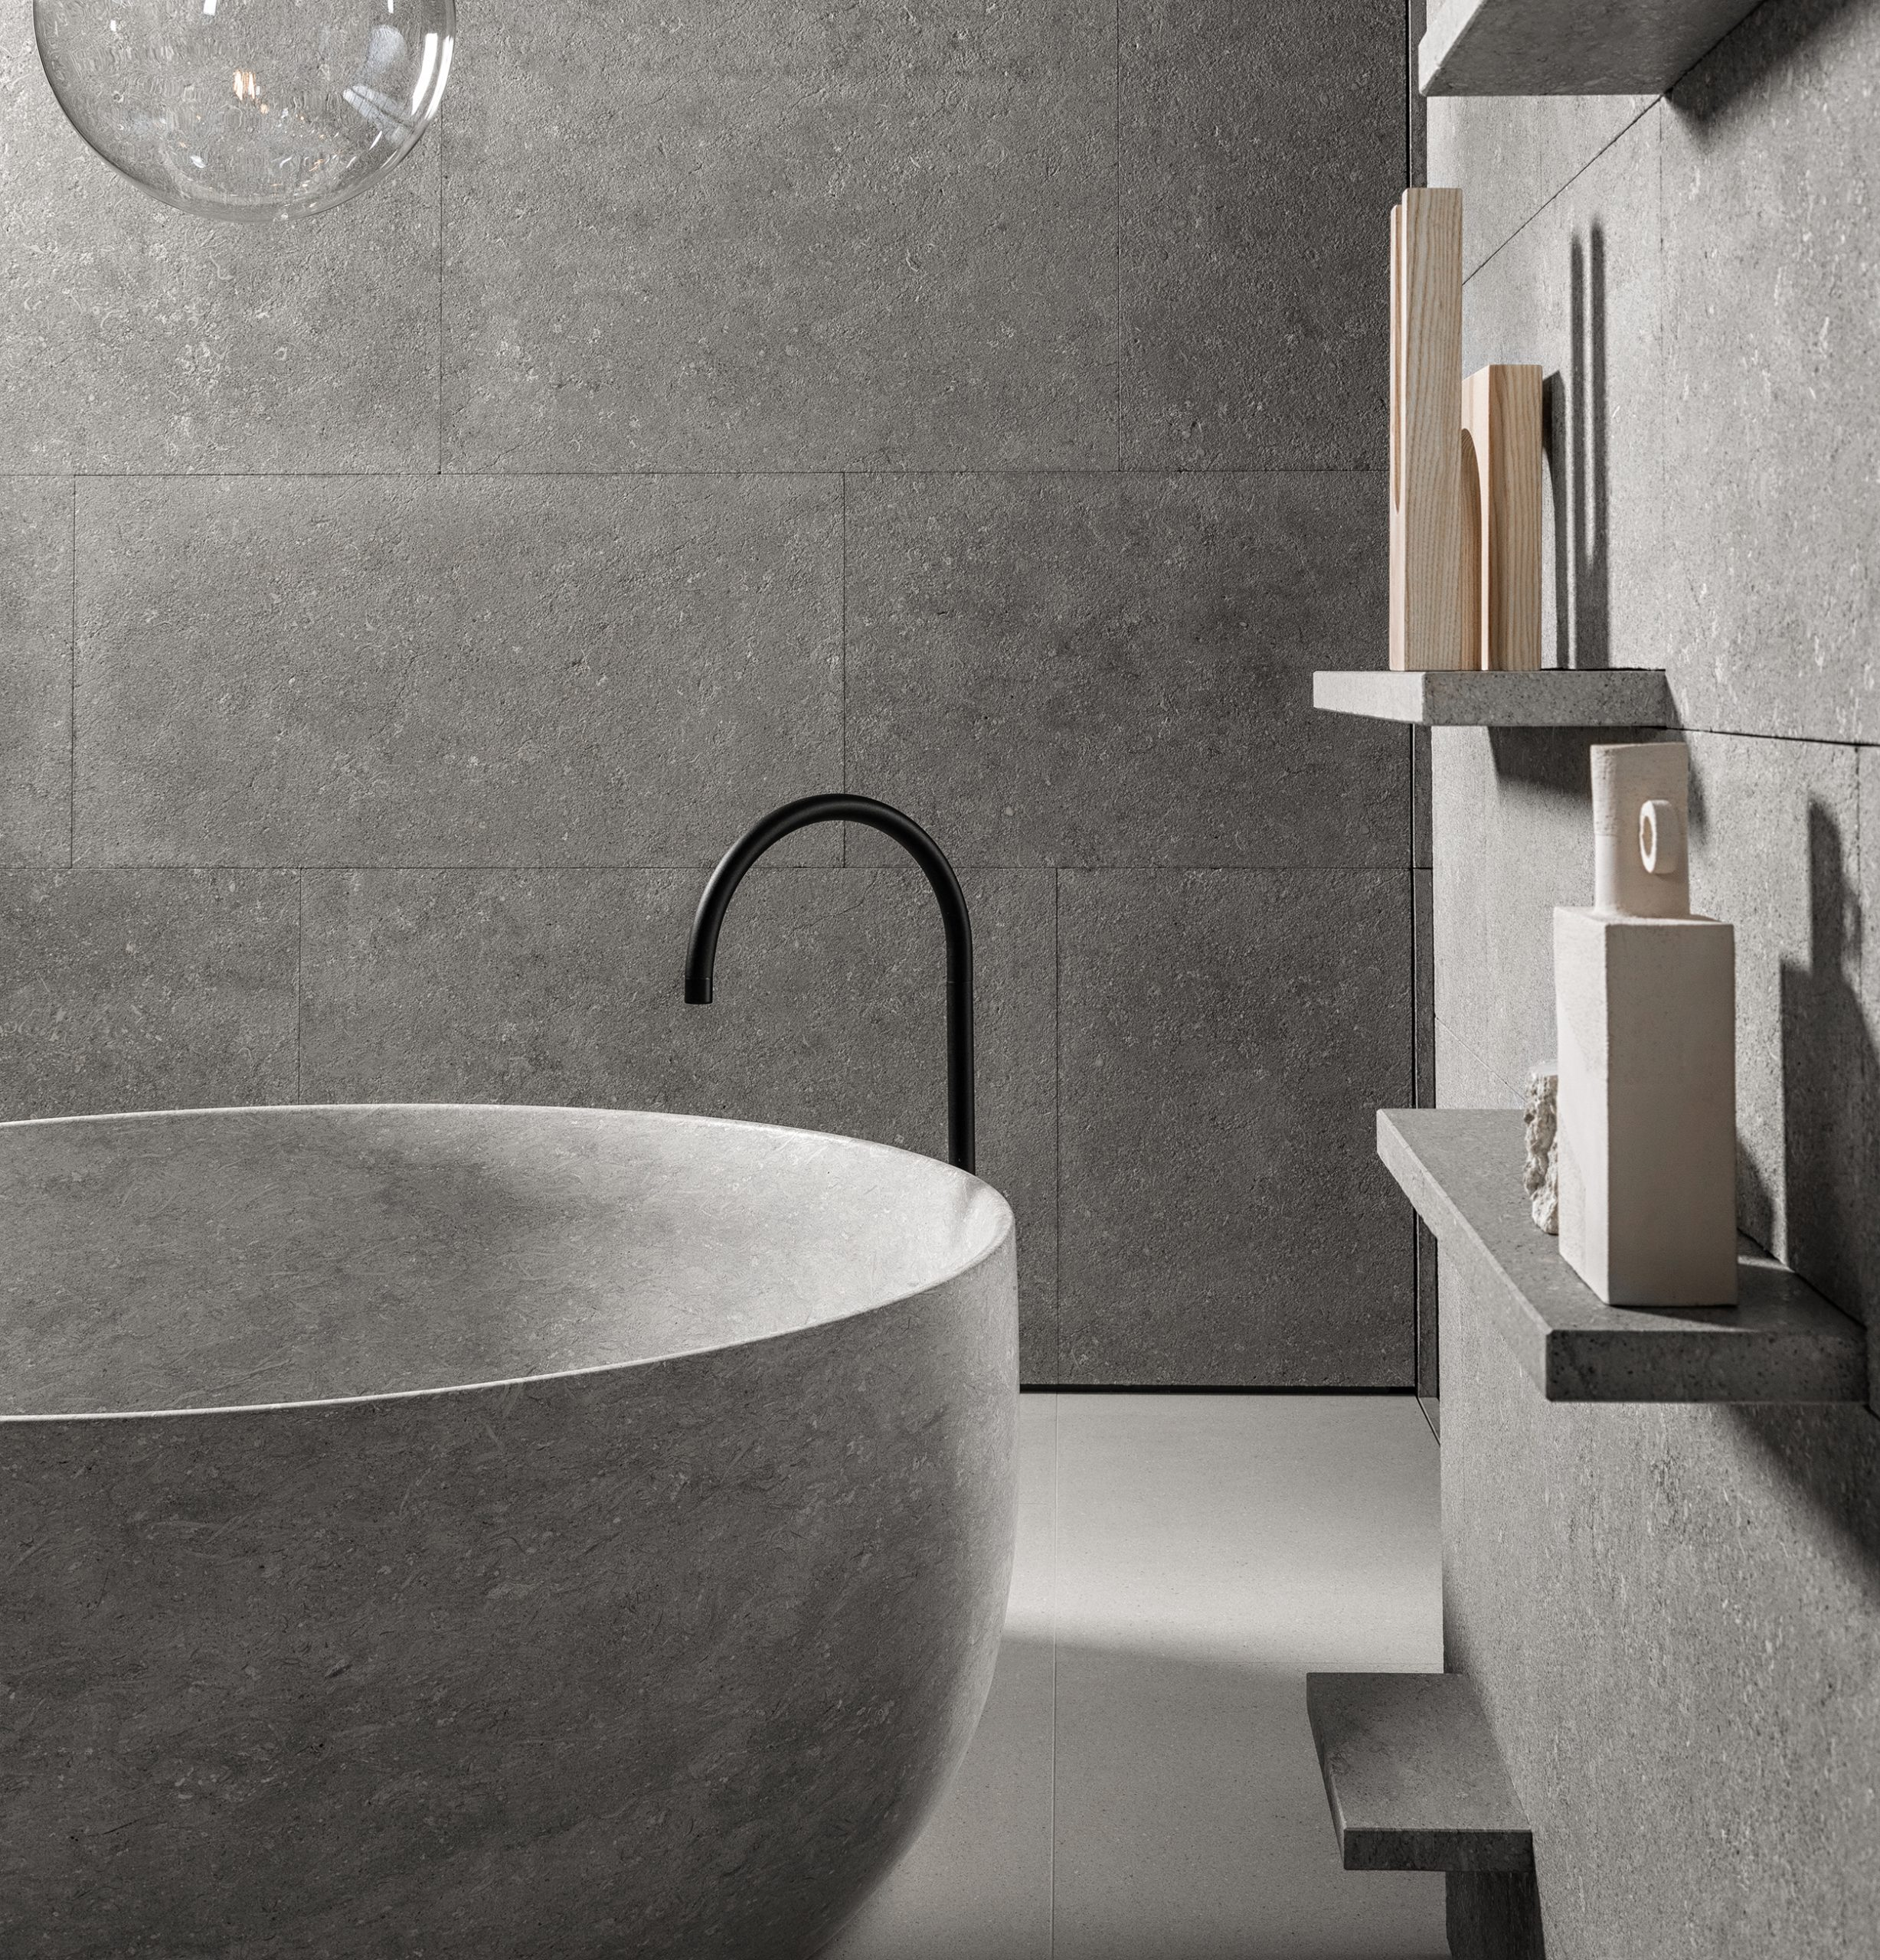 Detail of the Tetide bathtub, designed by Debiasi Sandri for Grassi Pietre